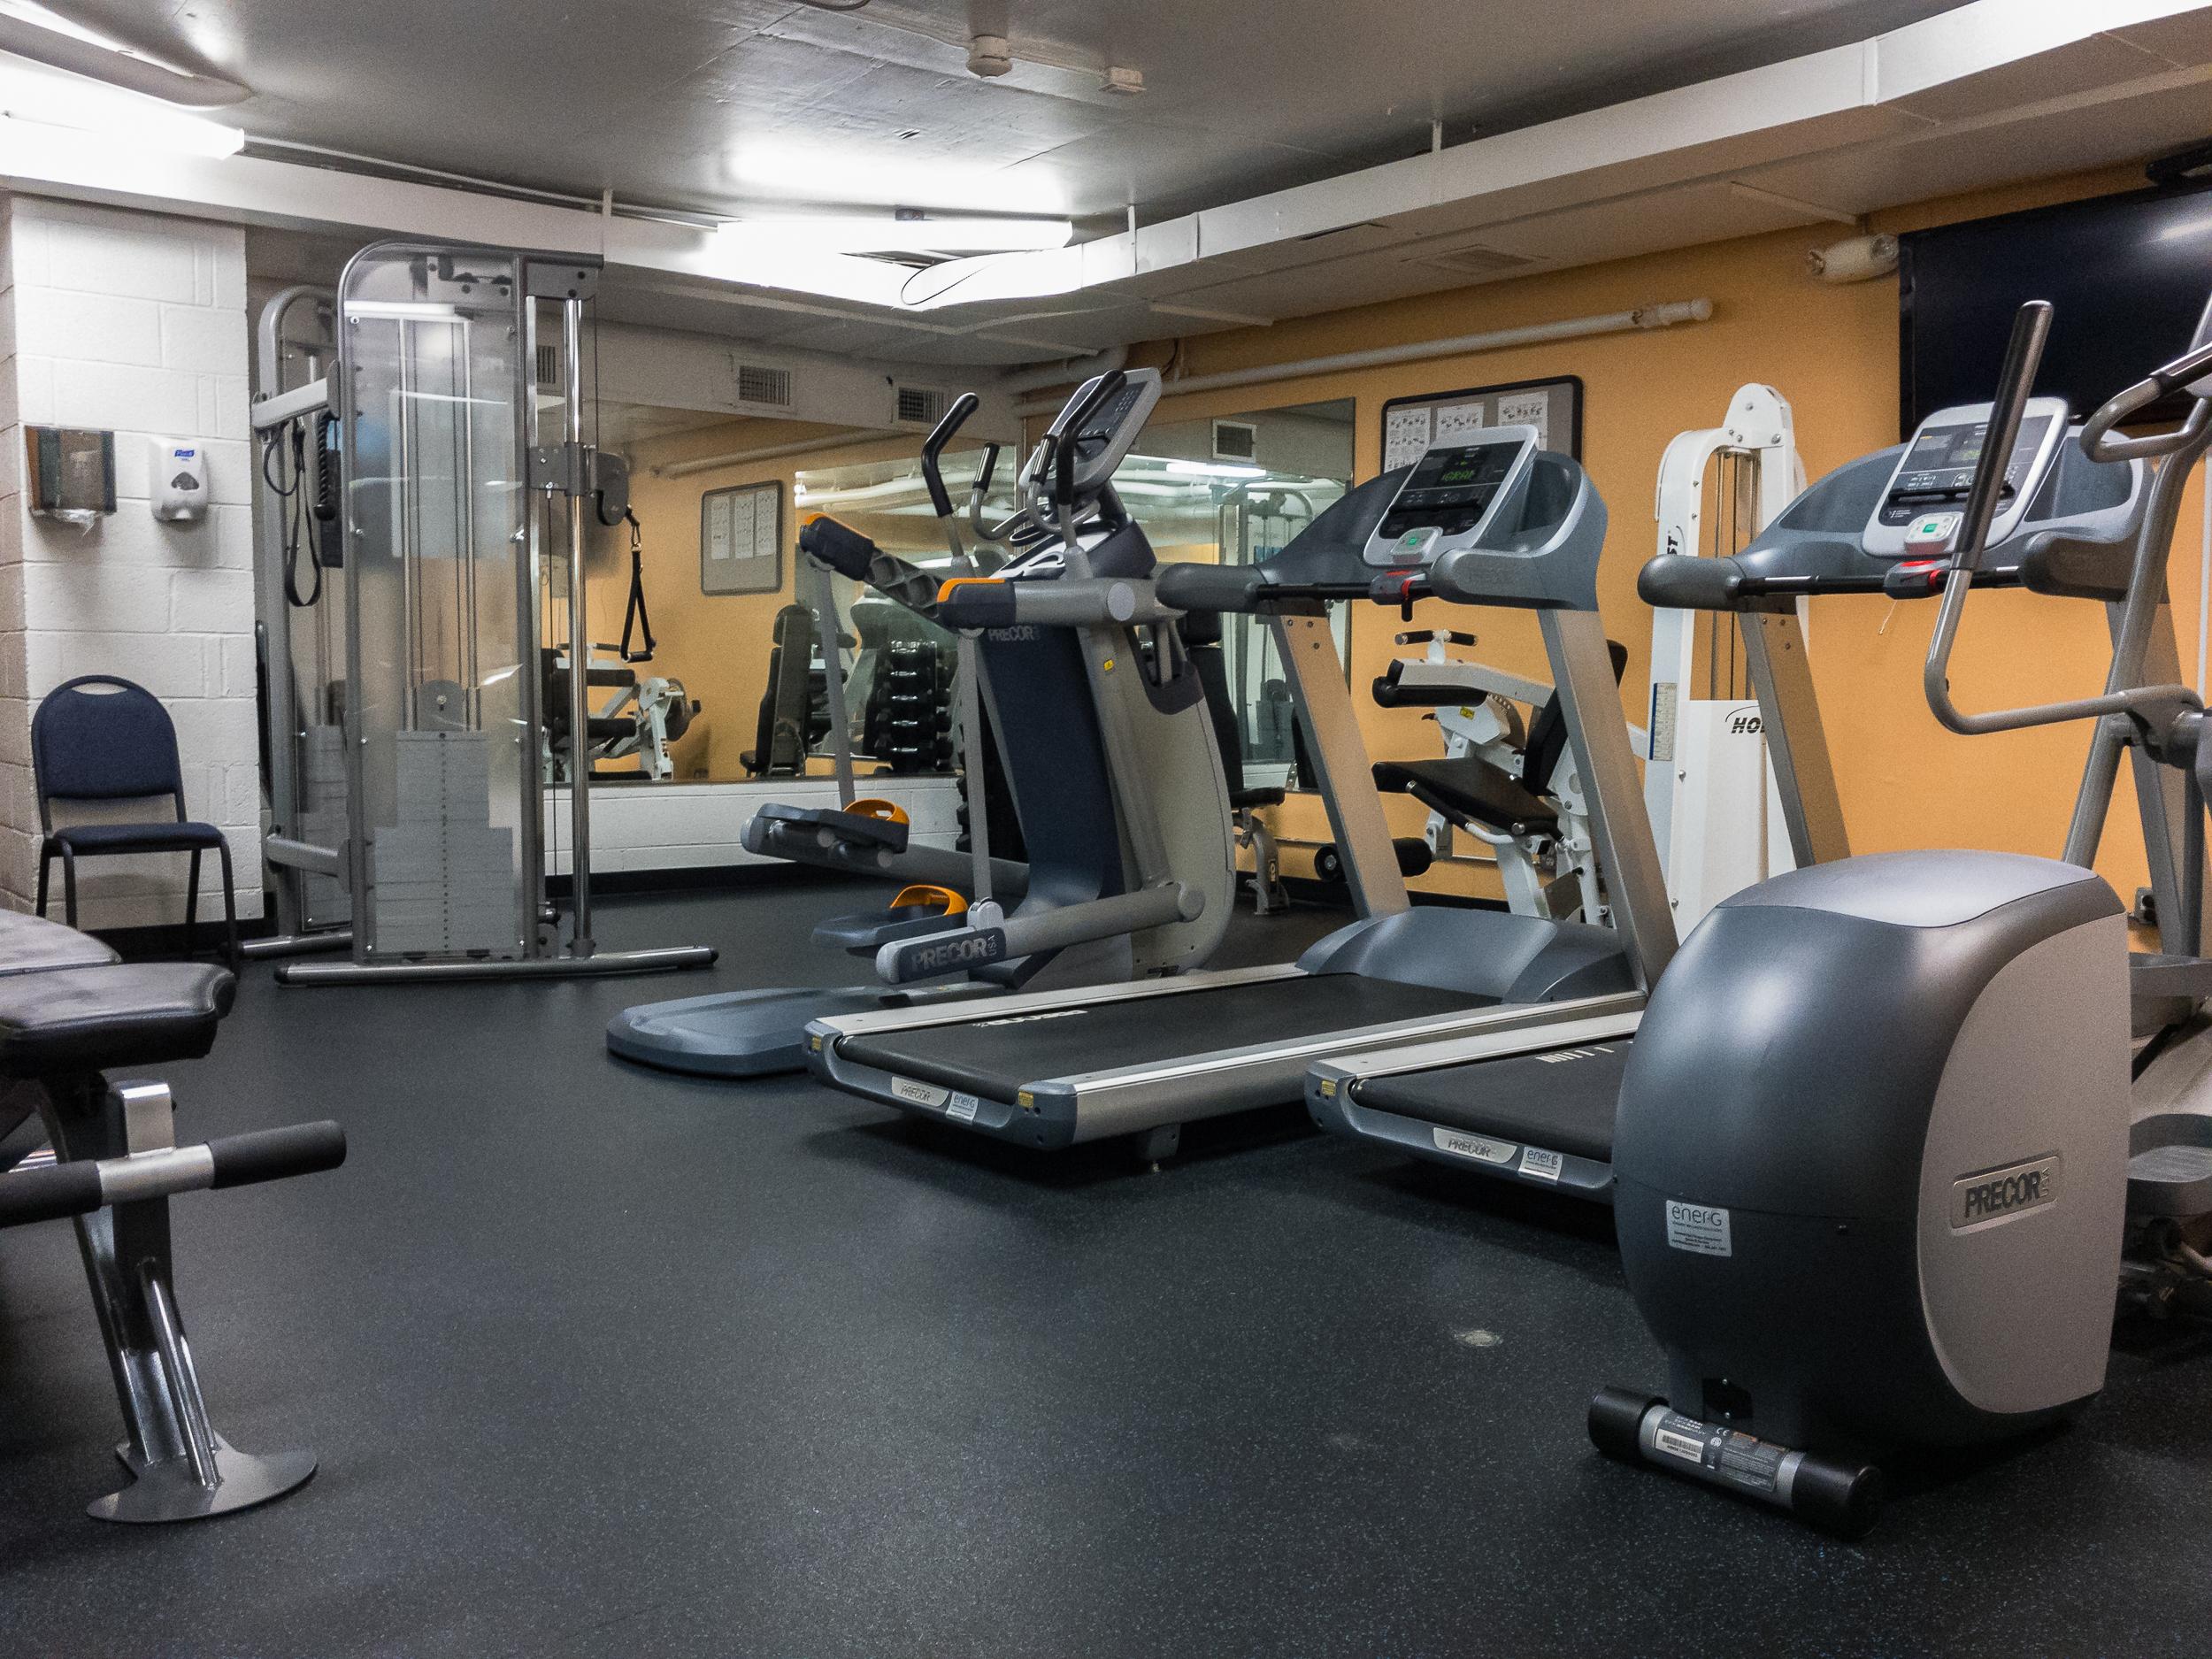 21_Watergate West Fitness Room.jpg